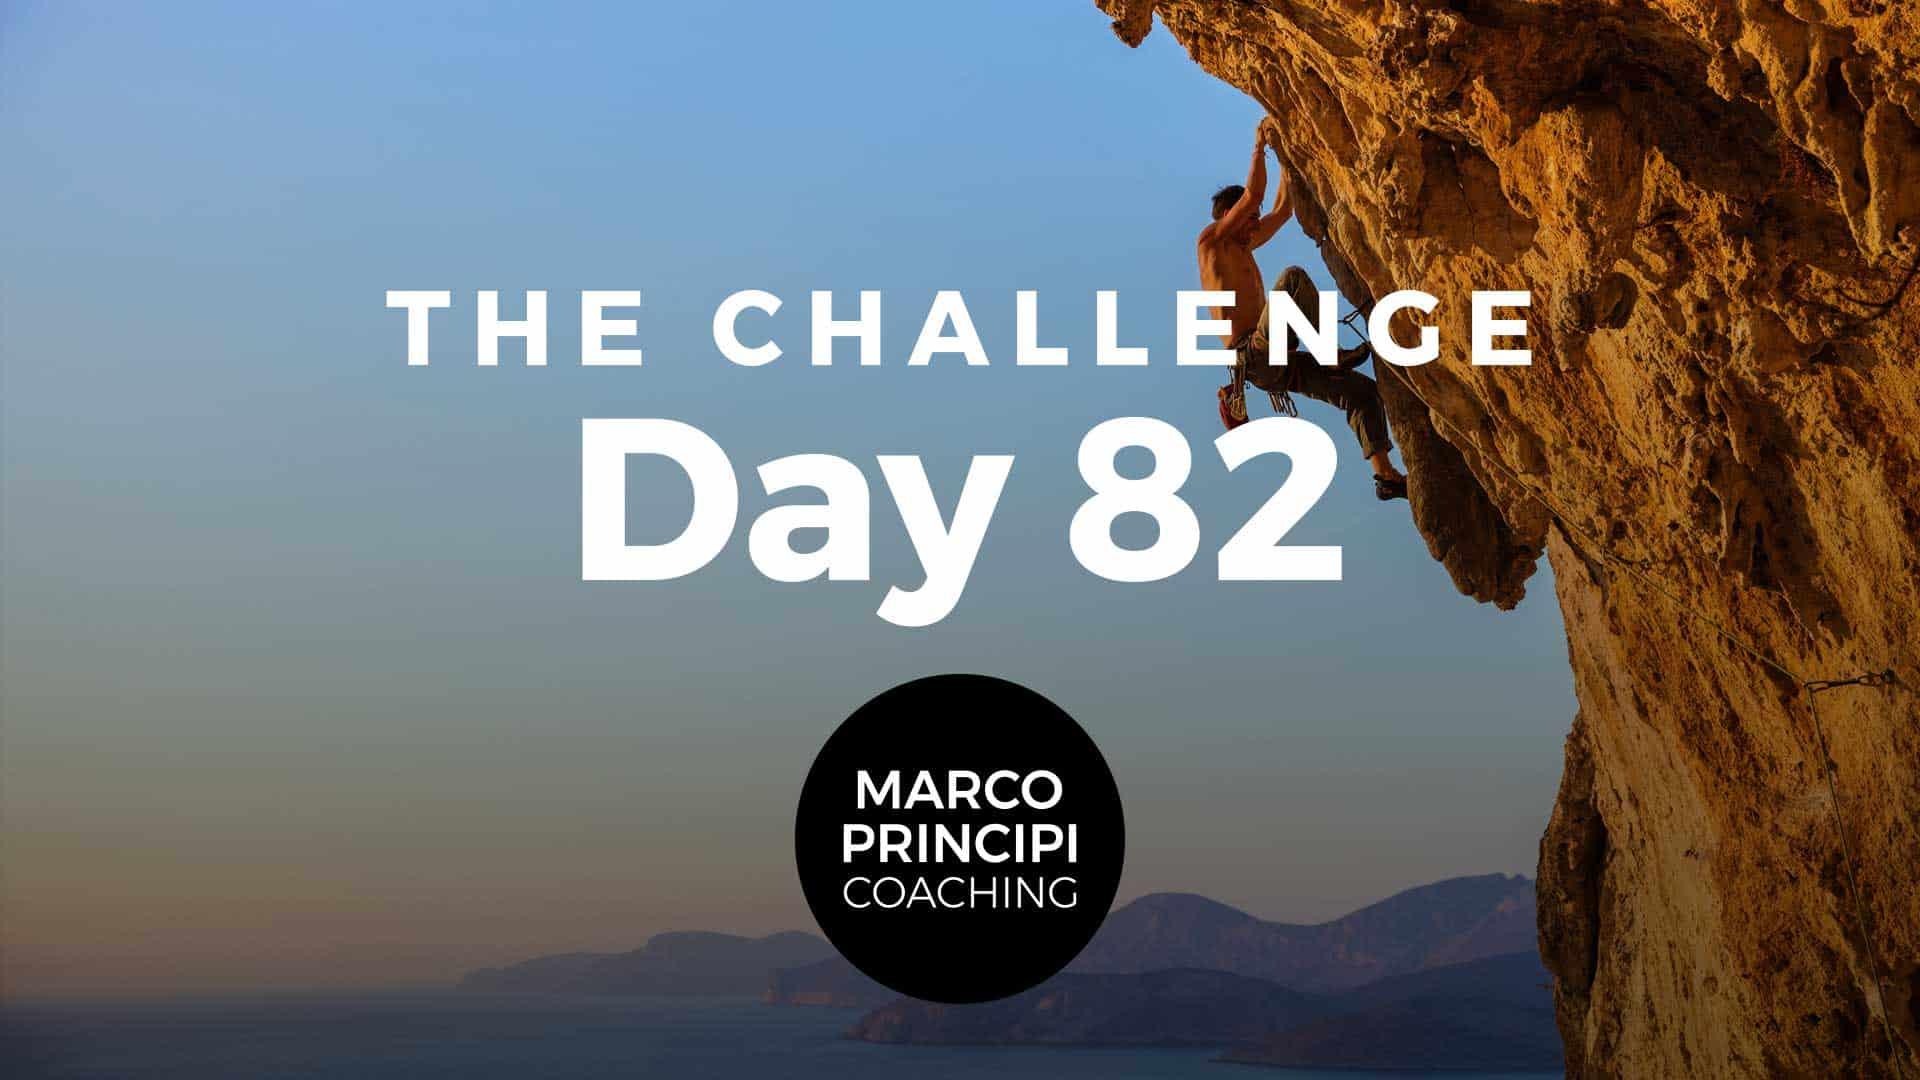 Marco Principi Coaching Challenge Day 82